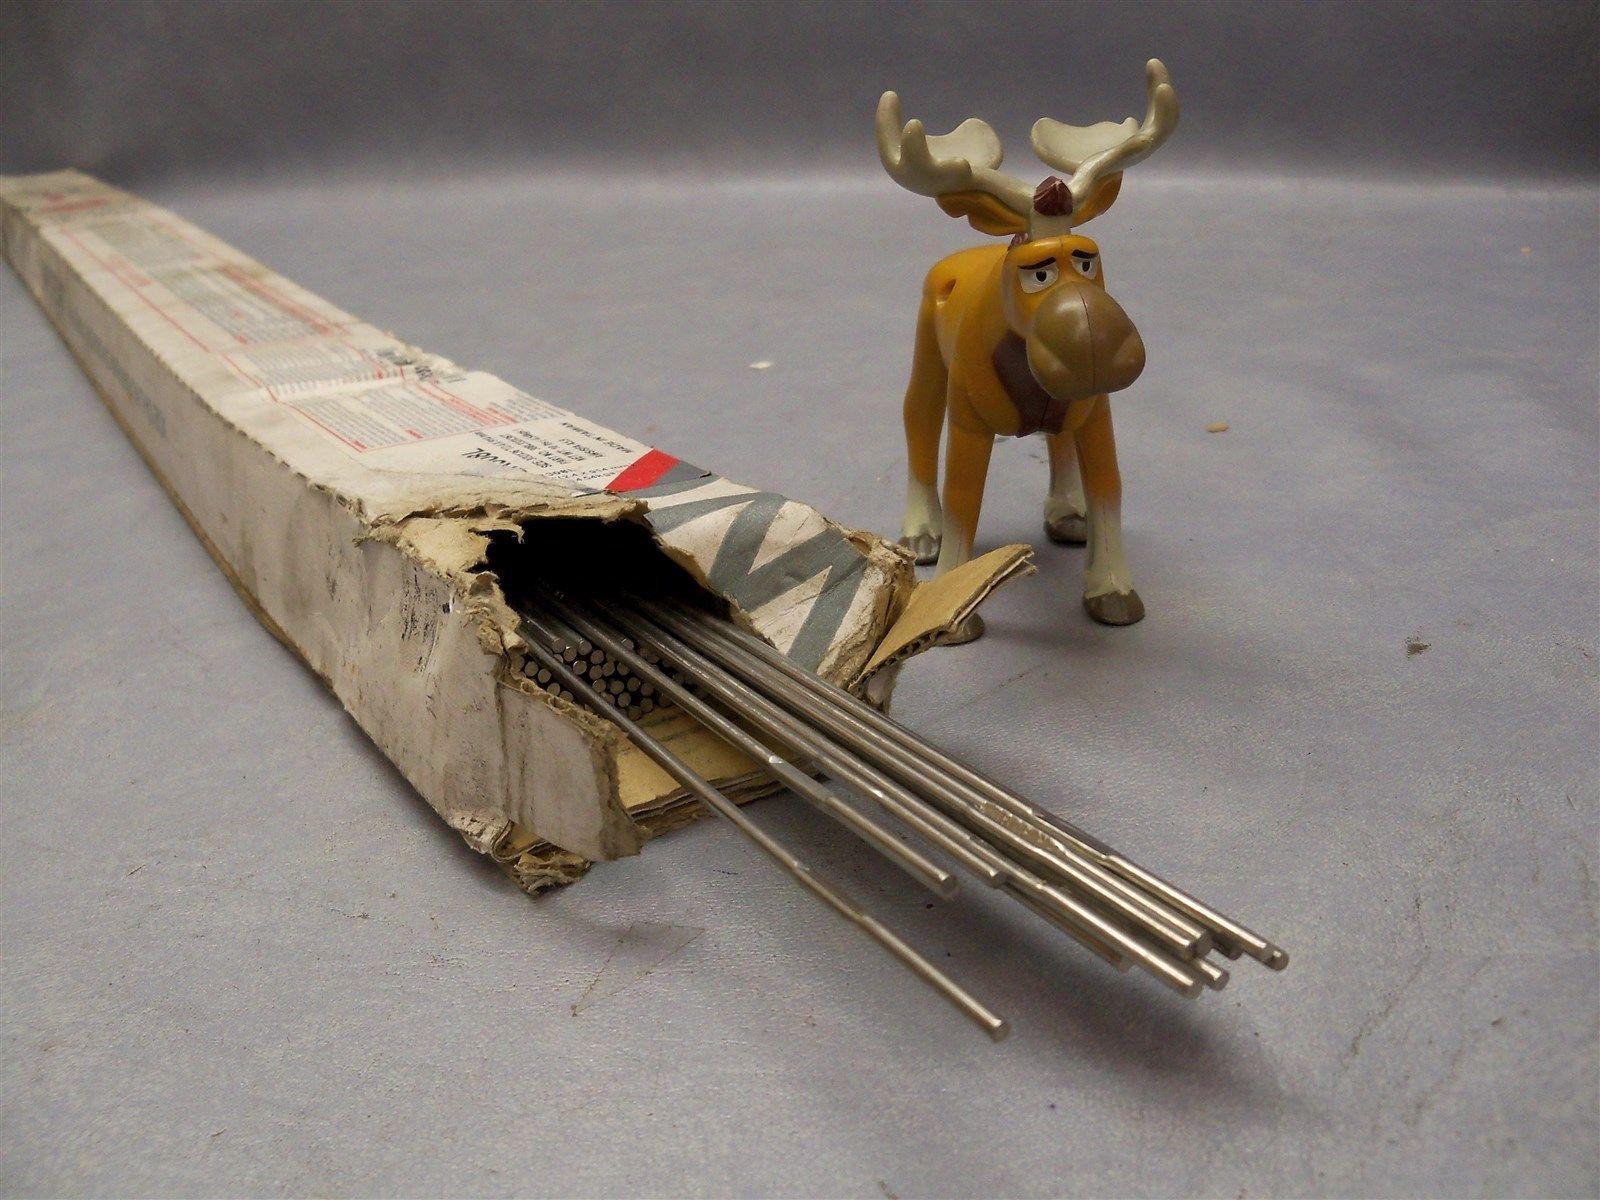 WeldCote Welding Rods 3/32 x 36 308L332x36T Heat 08B13082 Over 8 Pounds - $48.87